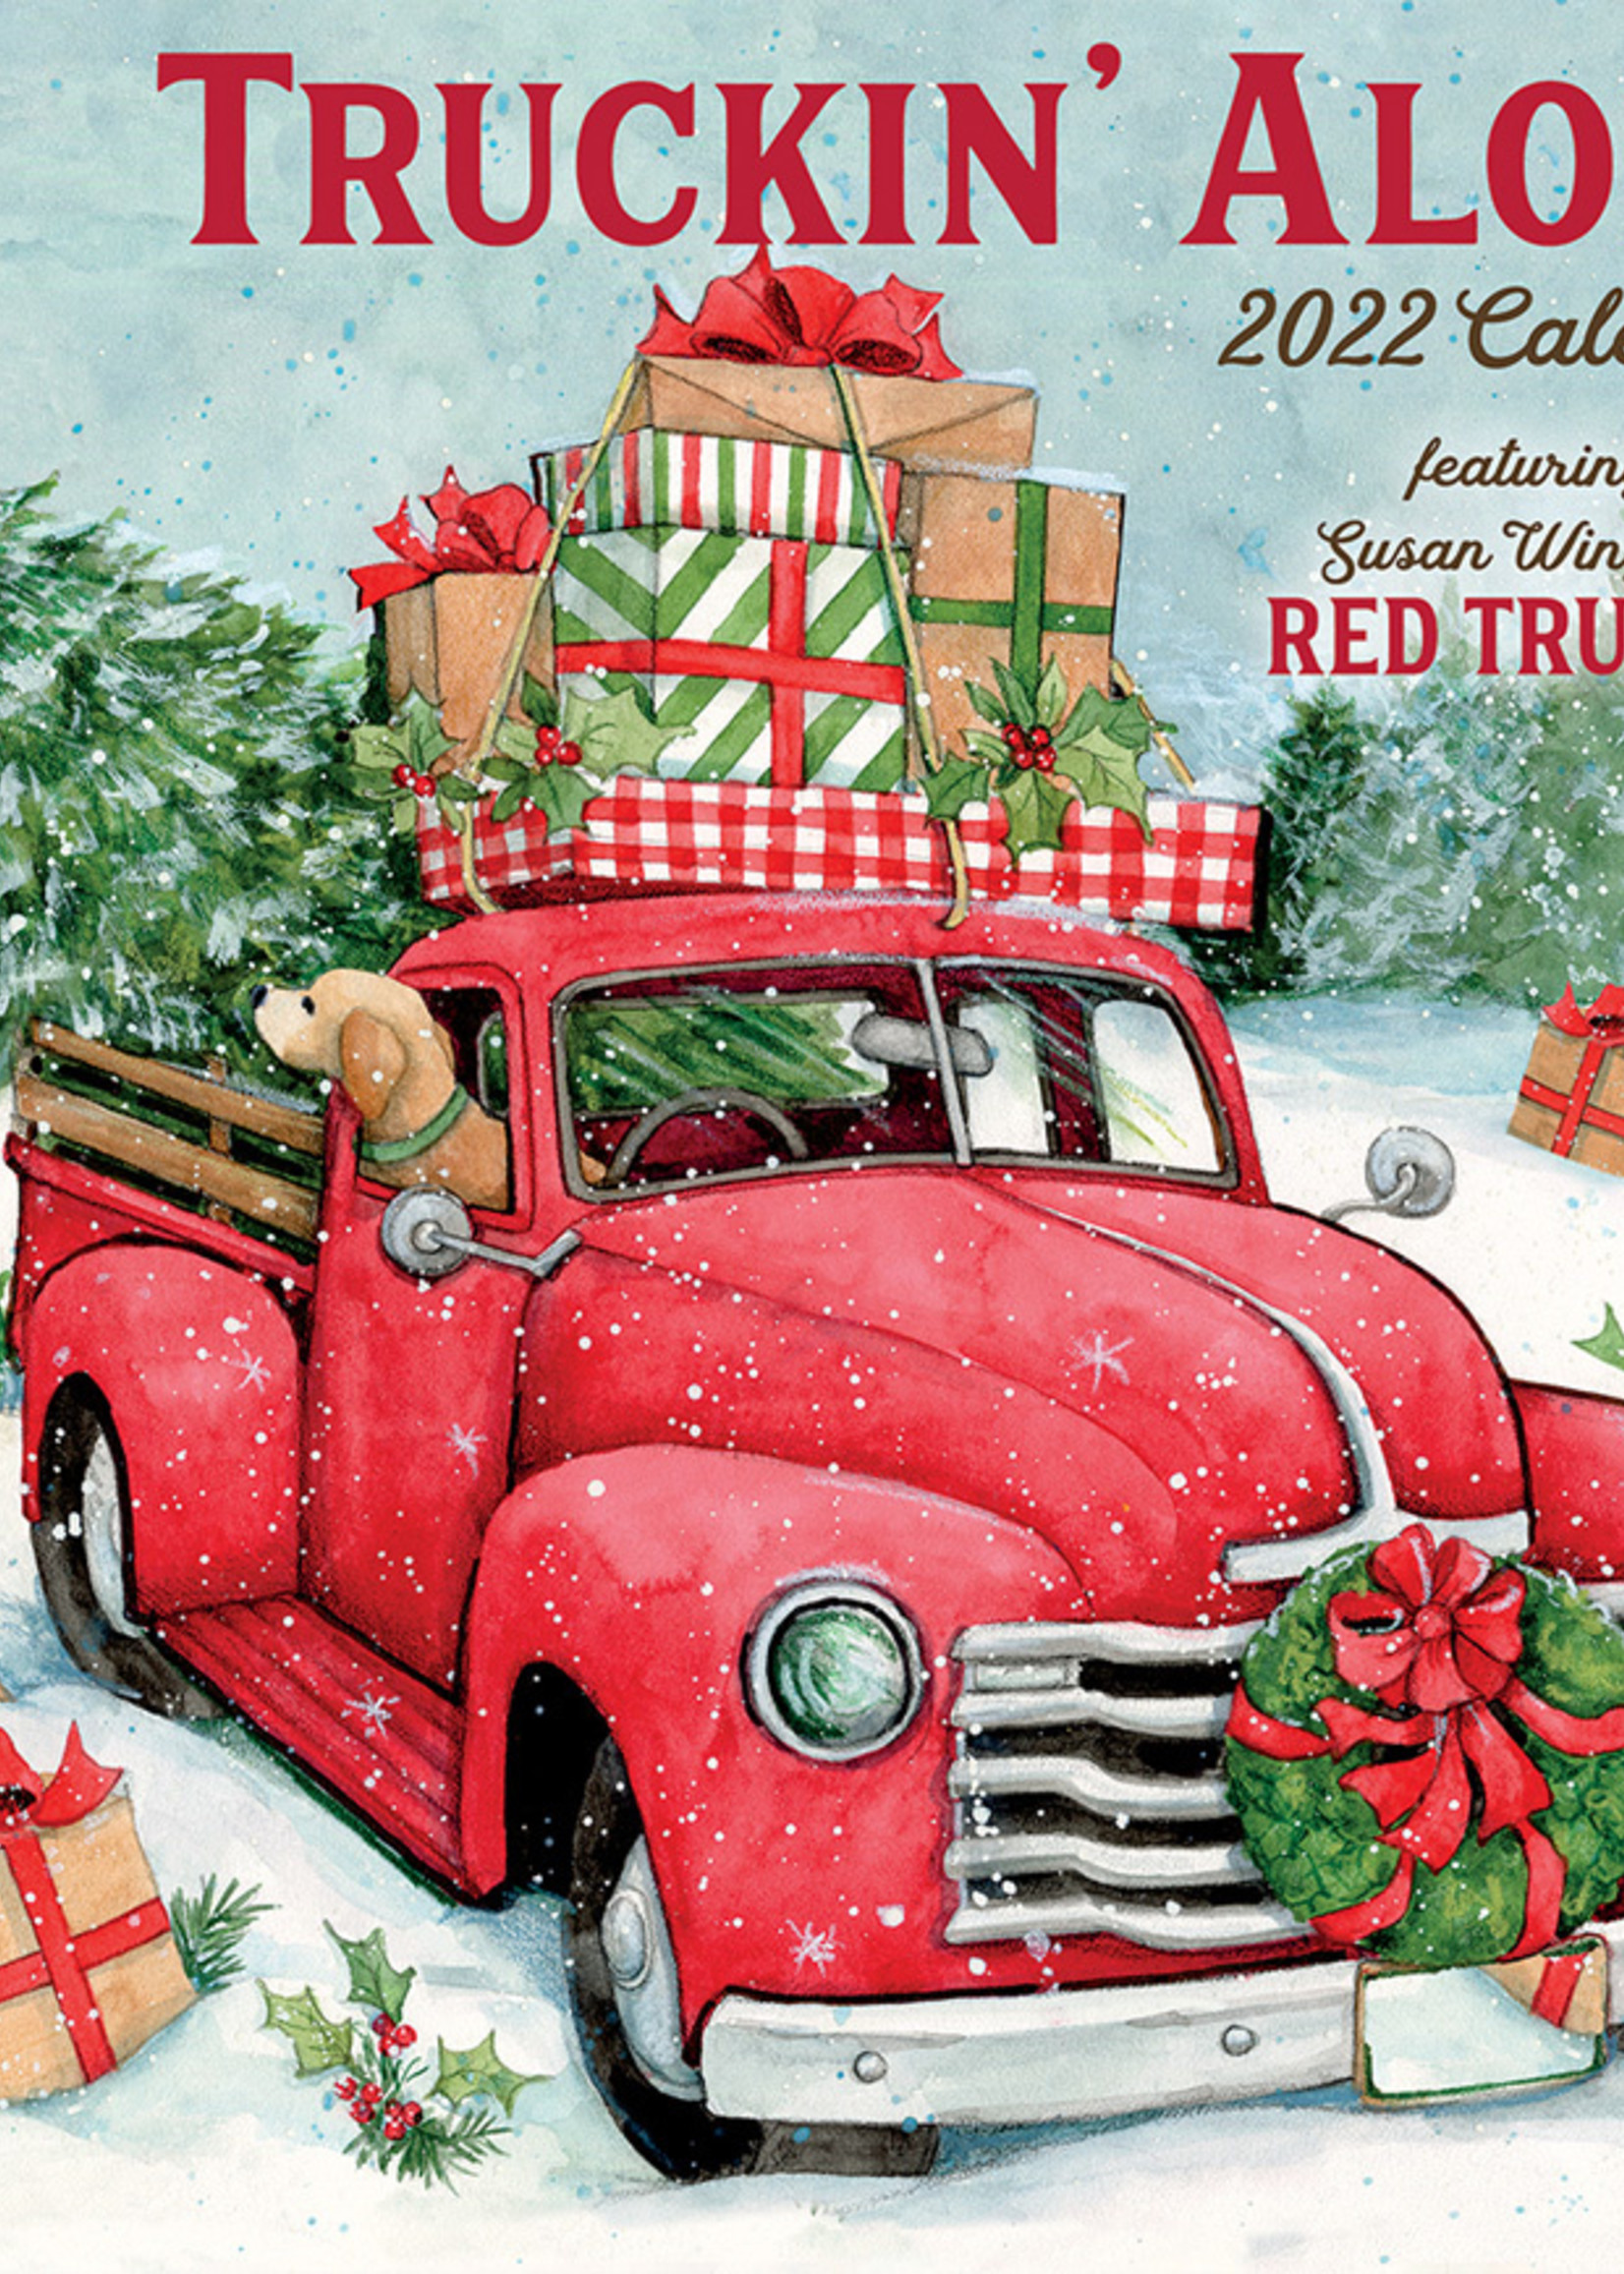 Truckin Along Calendar 2022